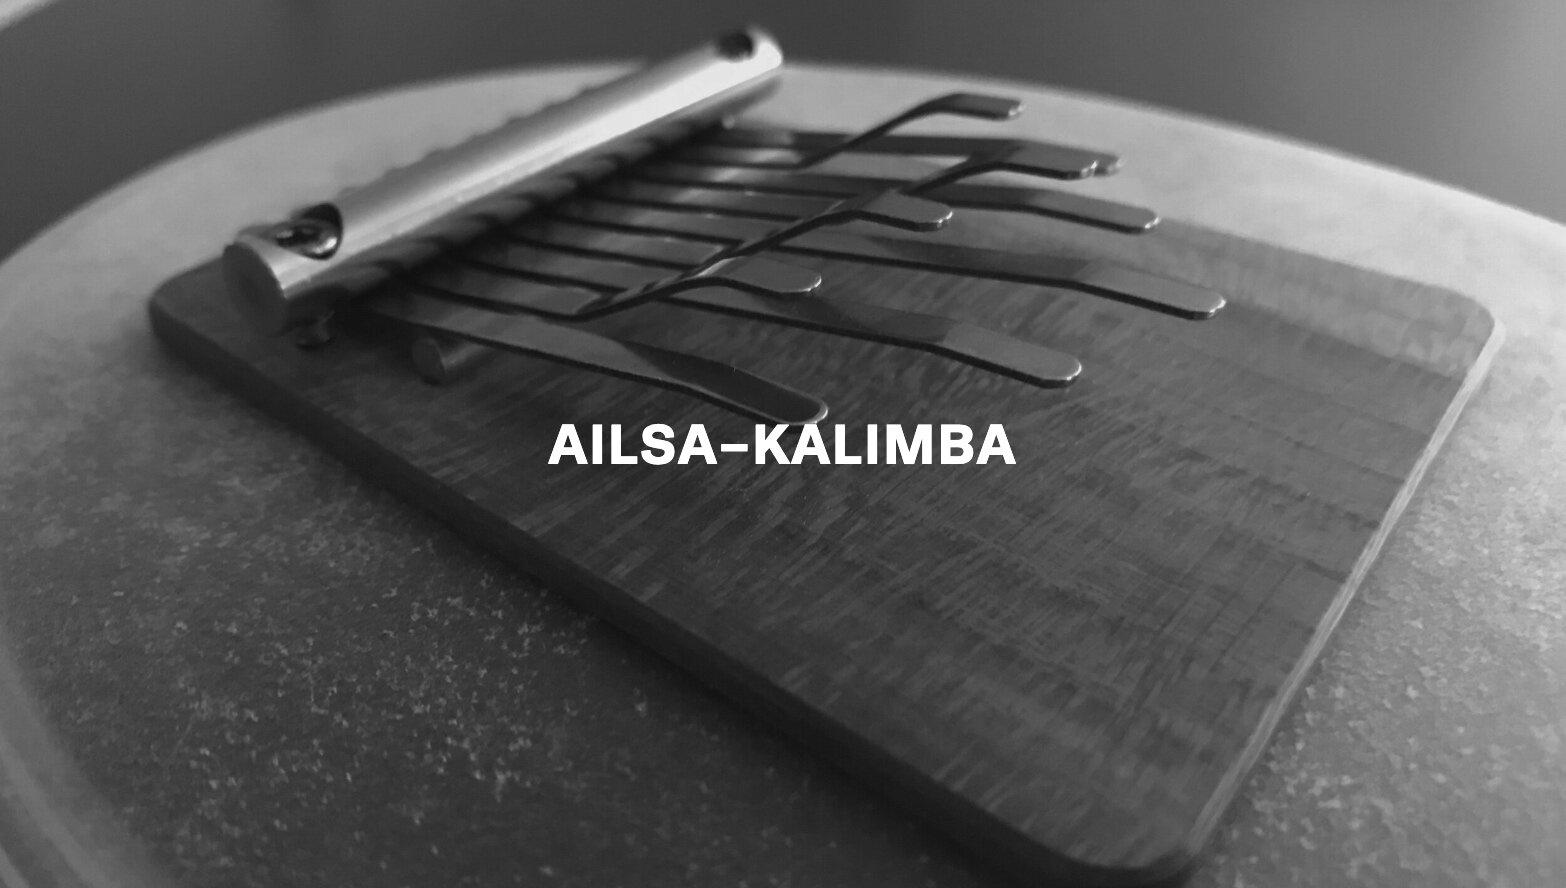 Ailsa-Kalimba Text.jpg